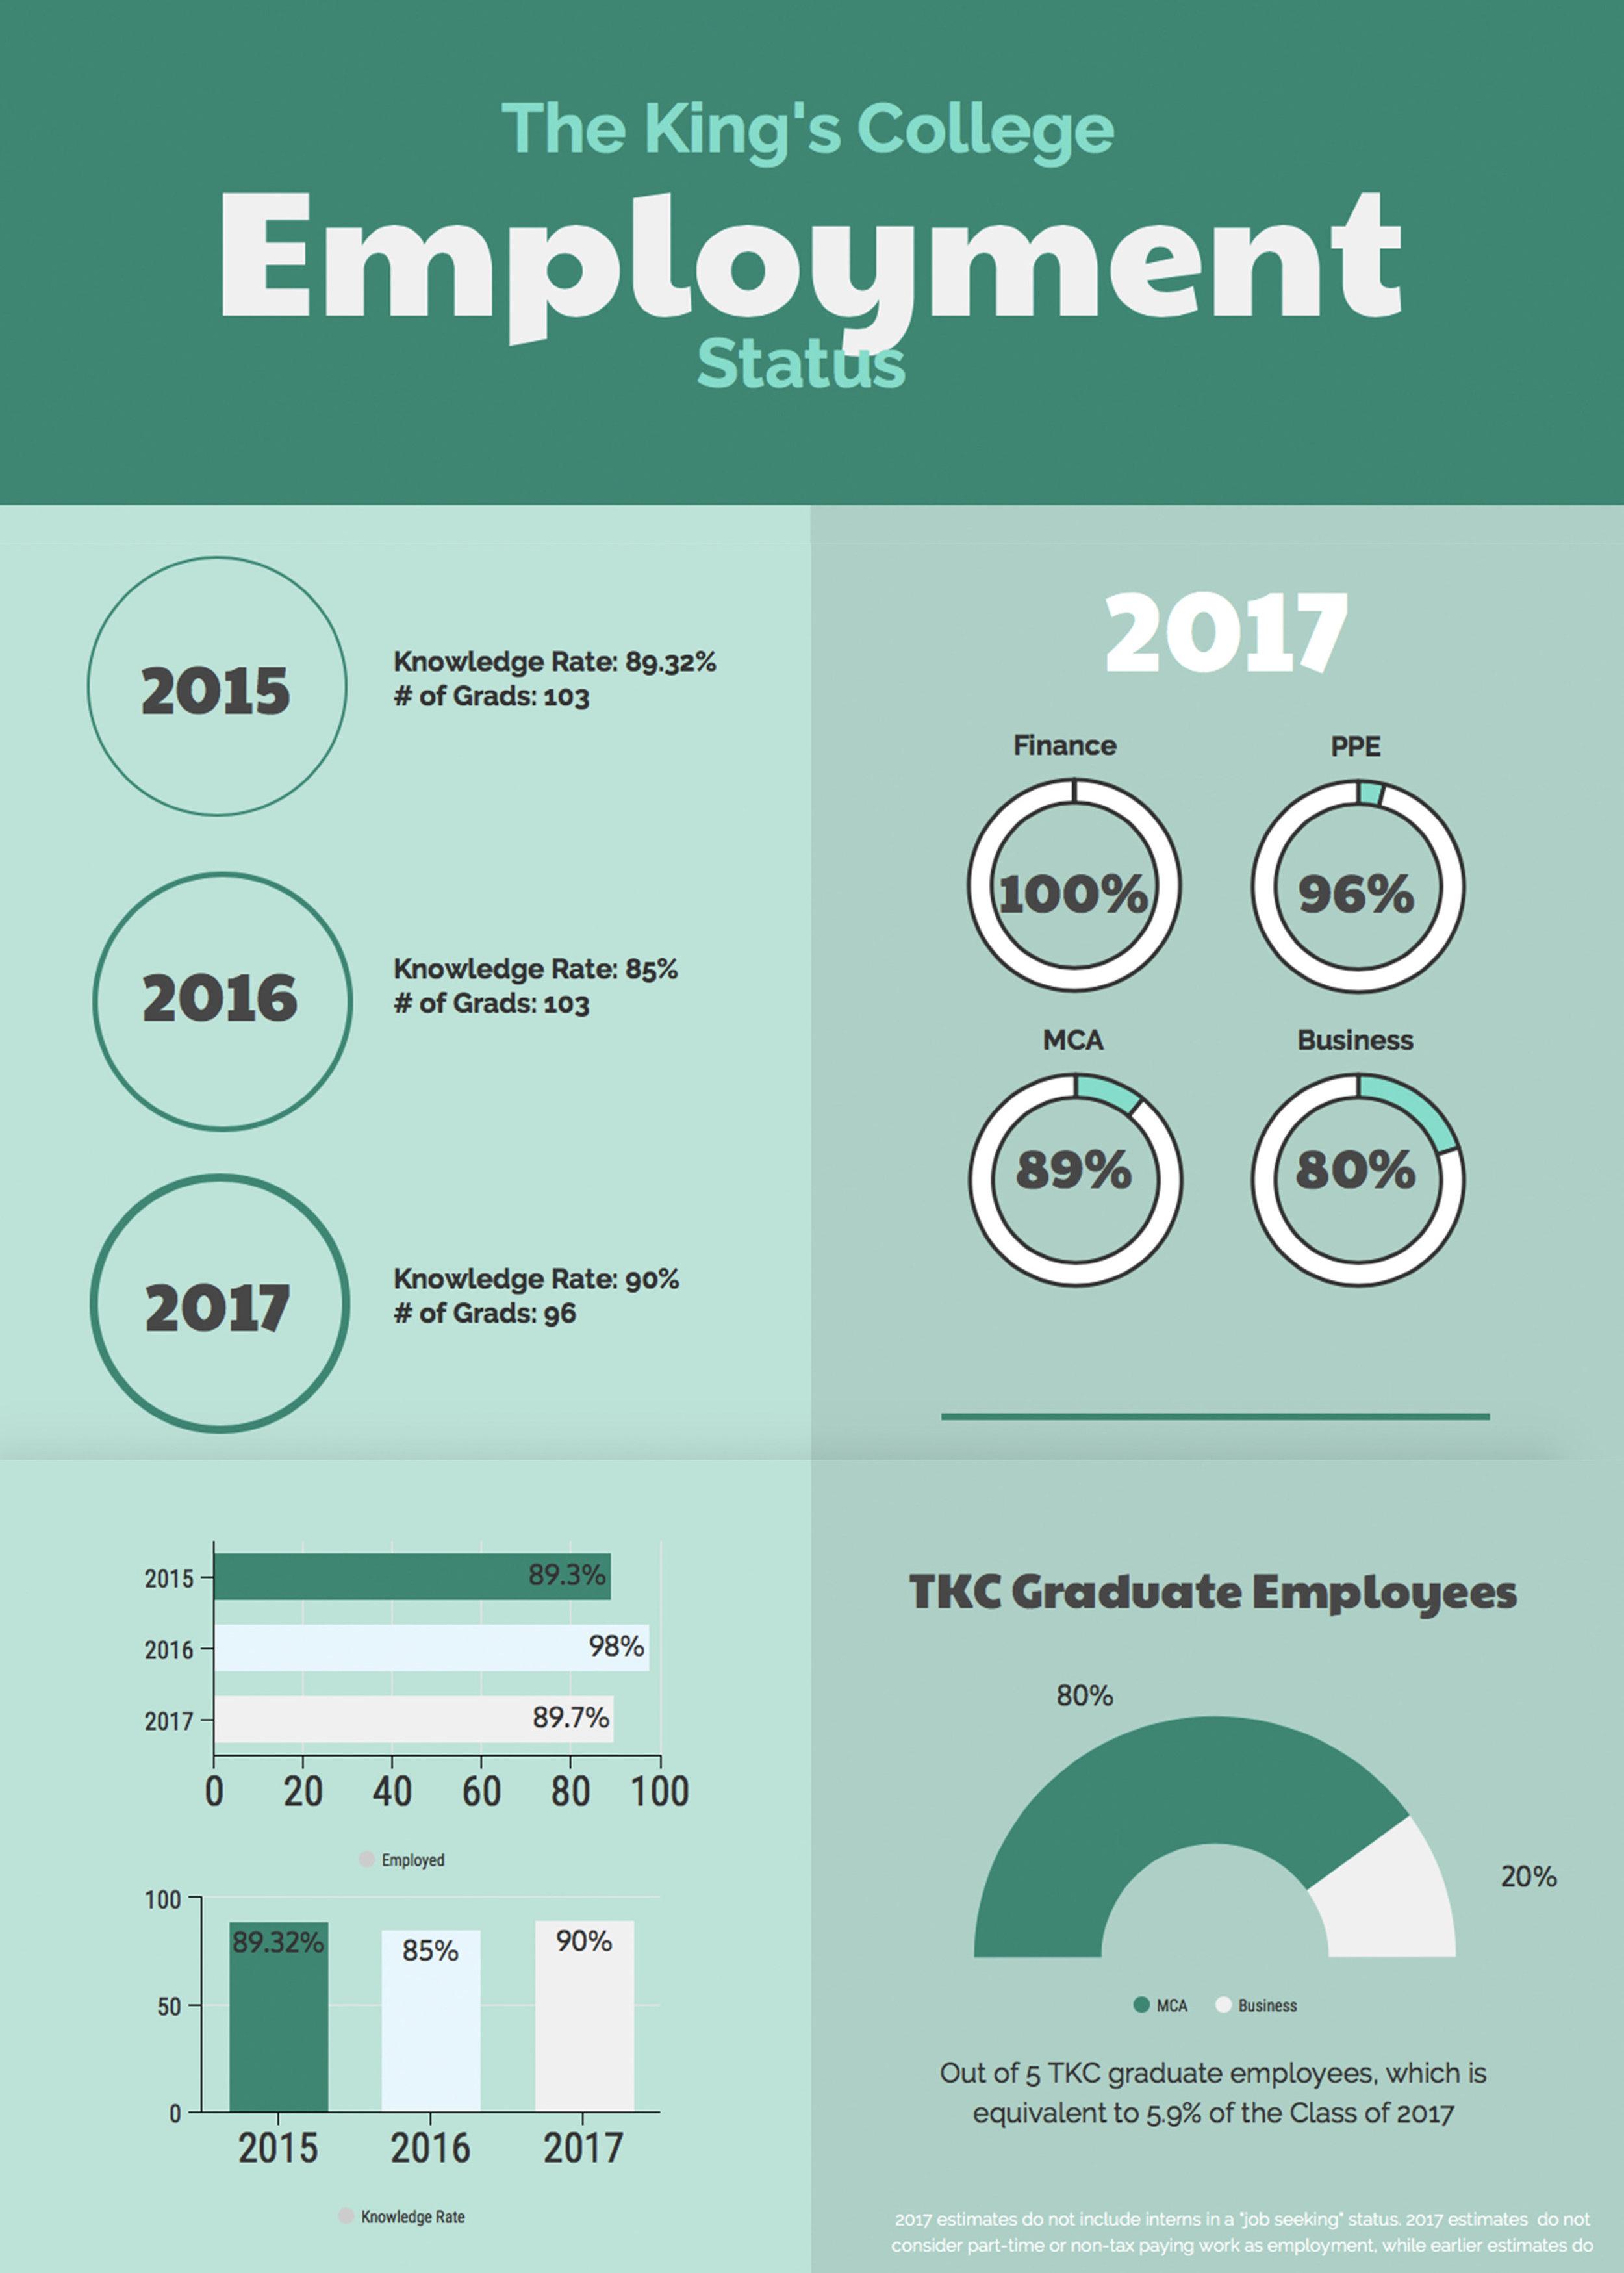 Infographic by Jessica Mathews